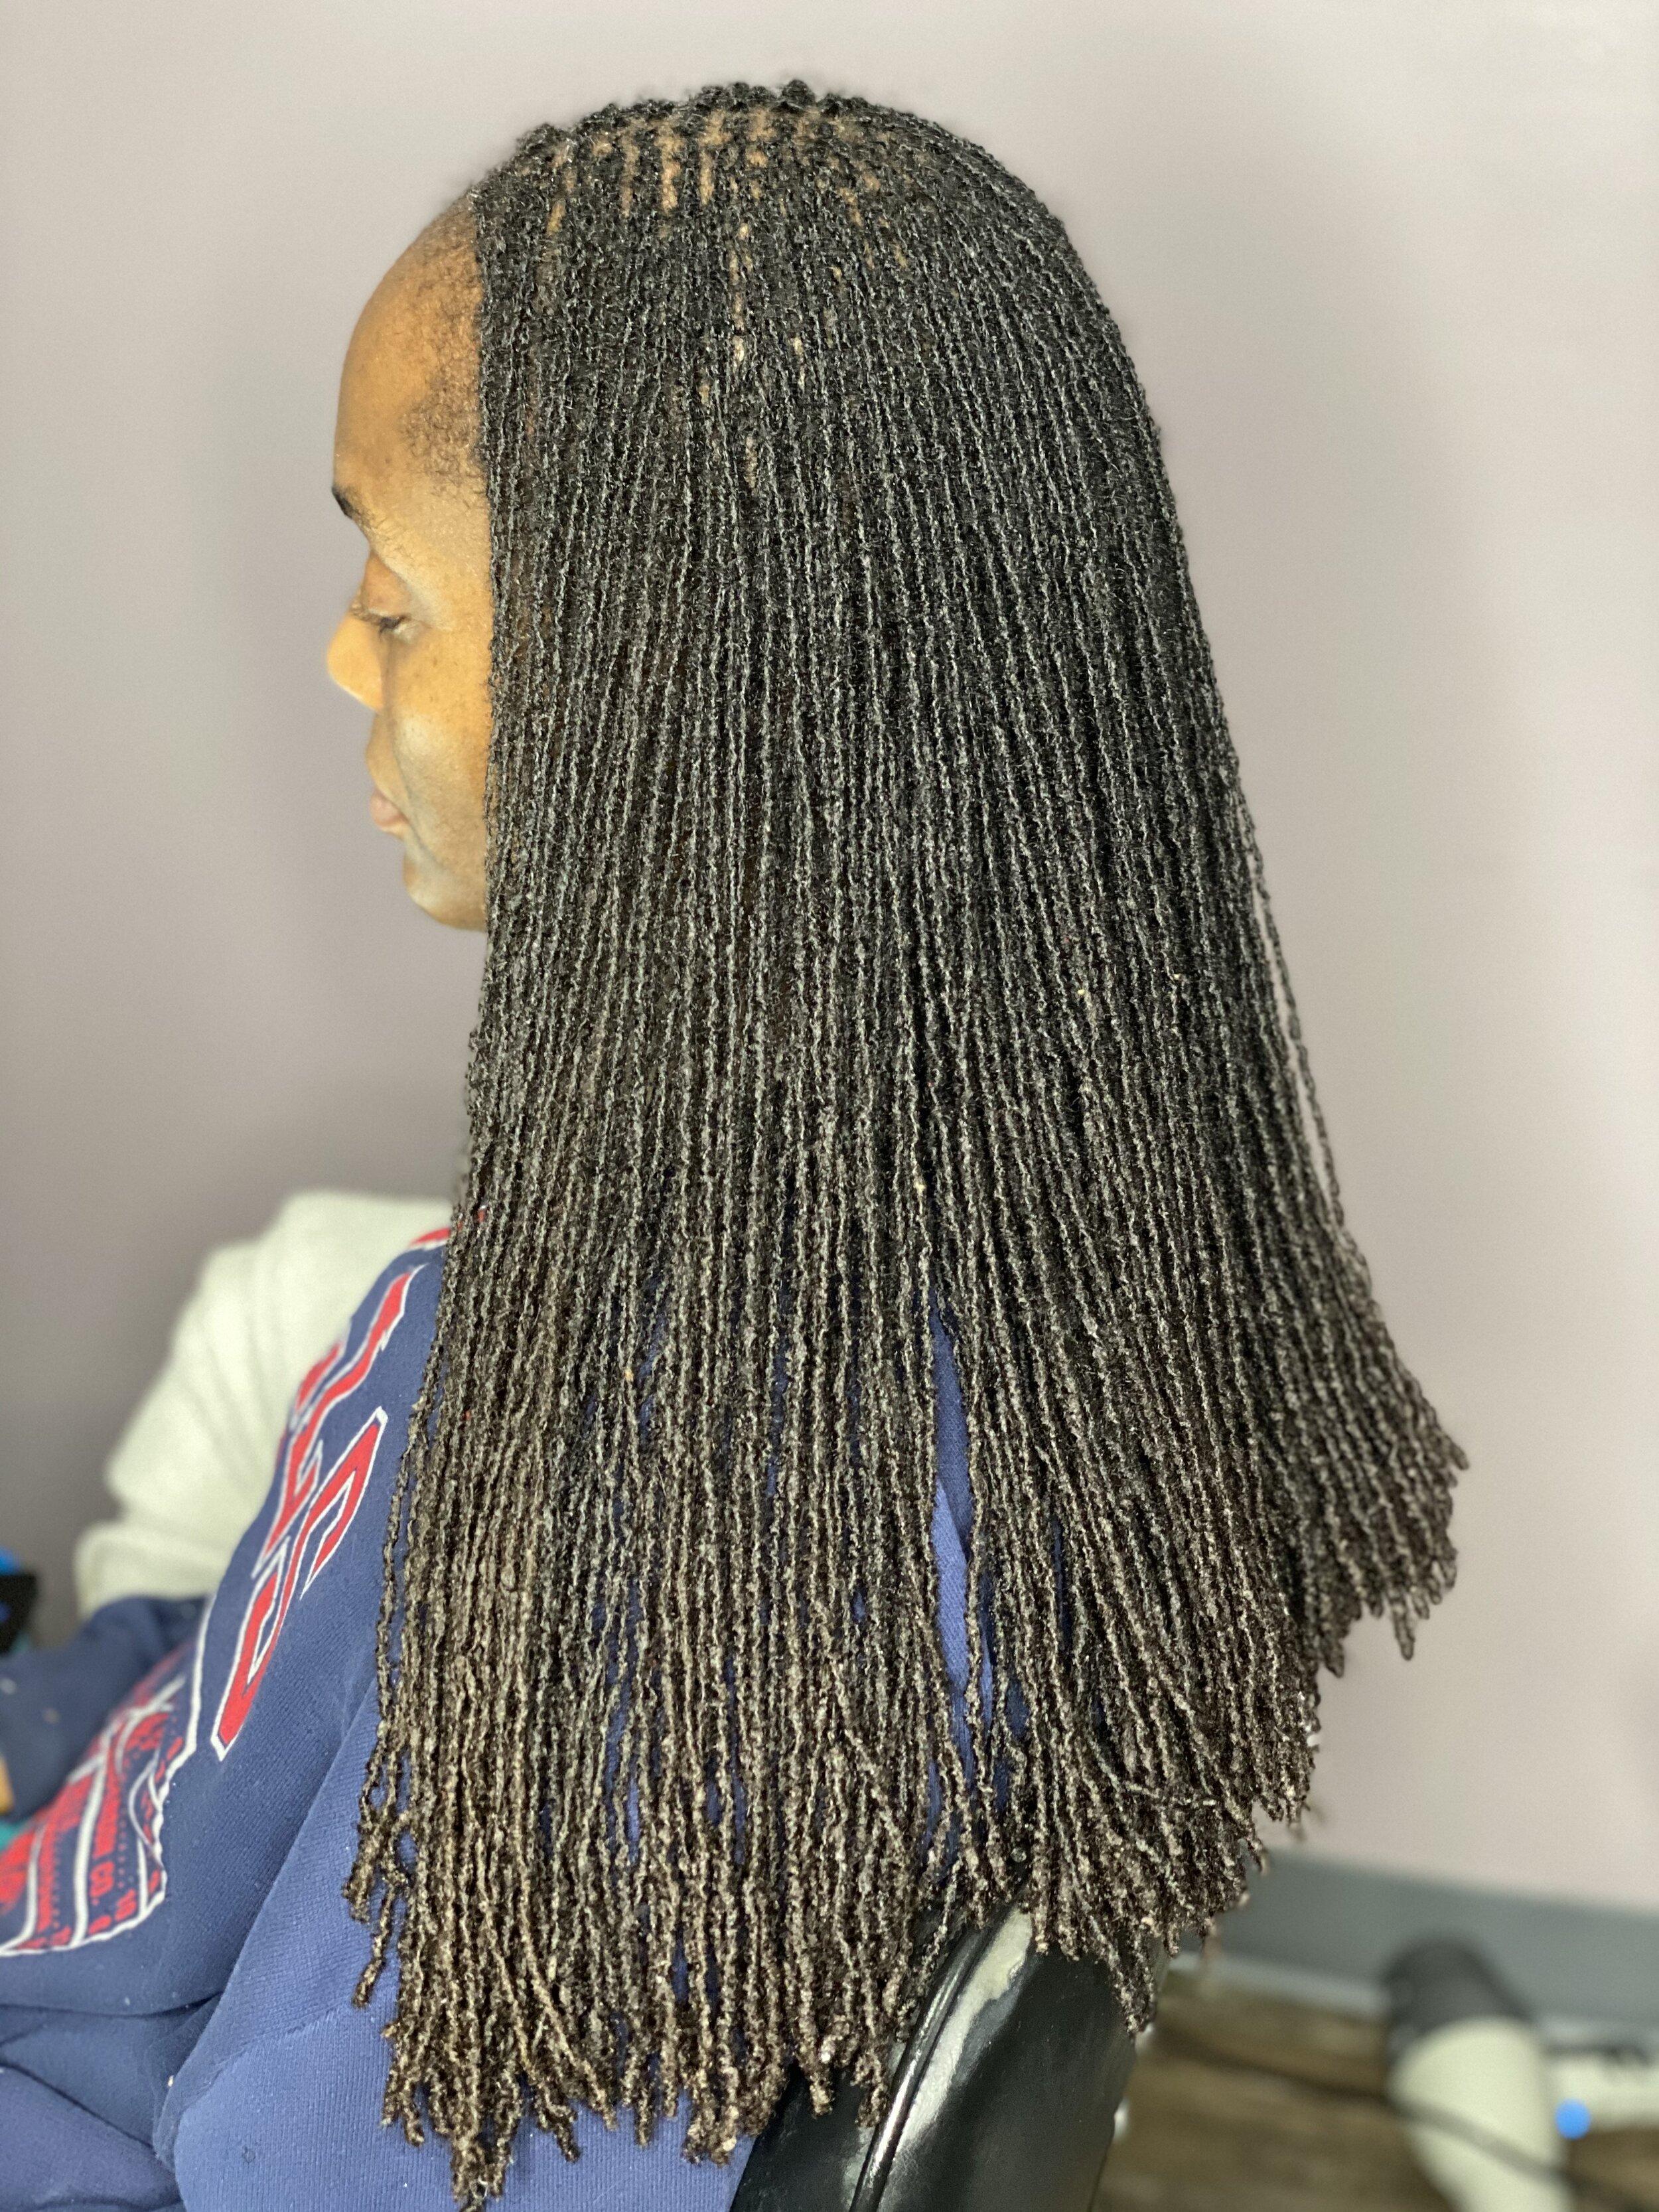 Natural Hair Salons In St Louis Mo : natural, salons, louis, Essence, Naturals, Salon